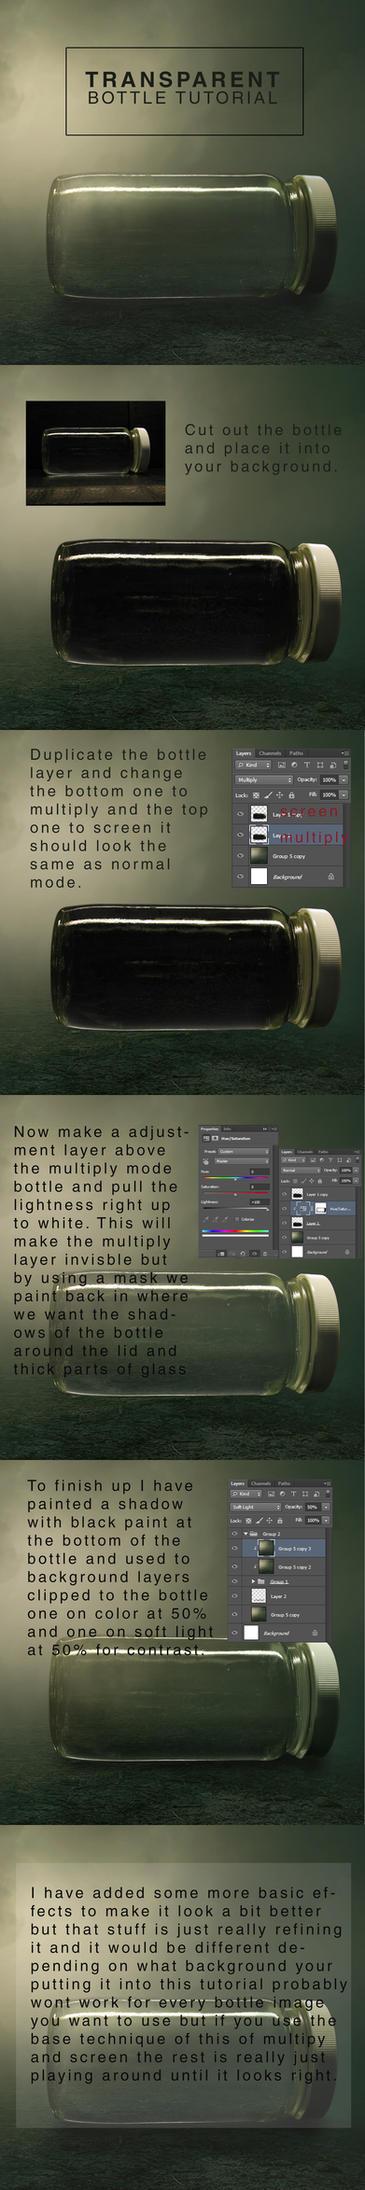 Transparent Bottle Tutorial by BenjaminHaley